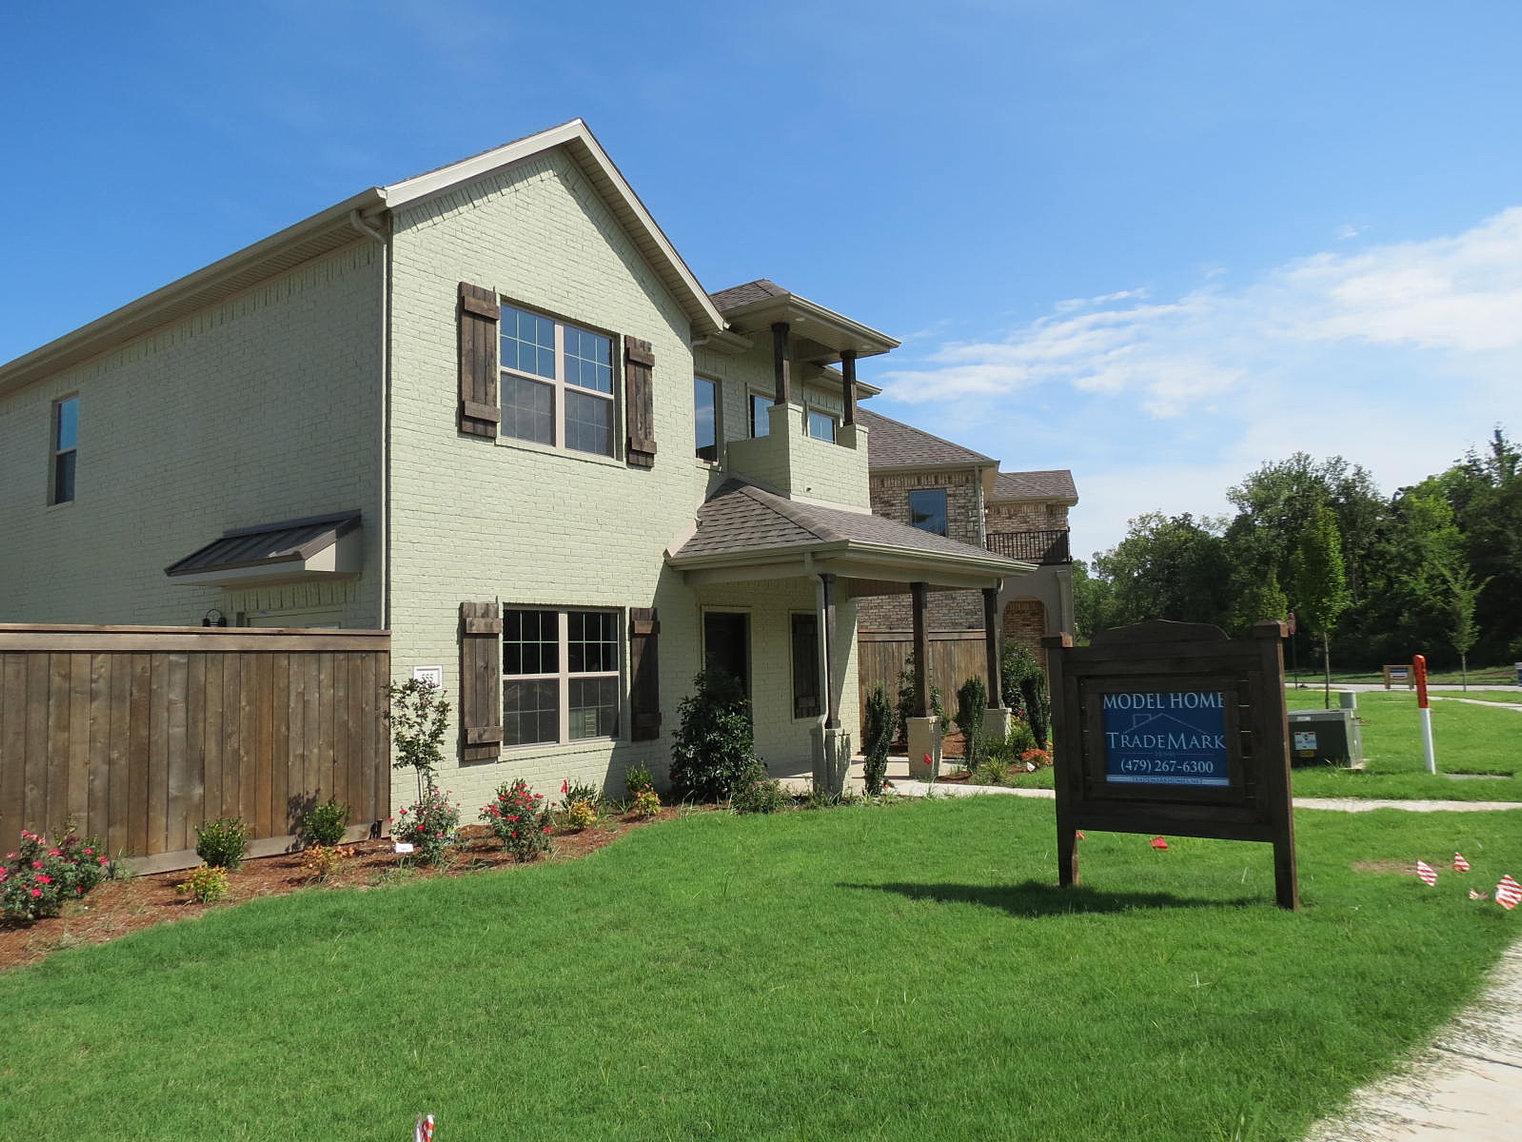 Trademark model home